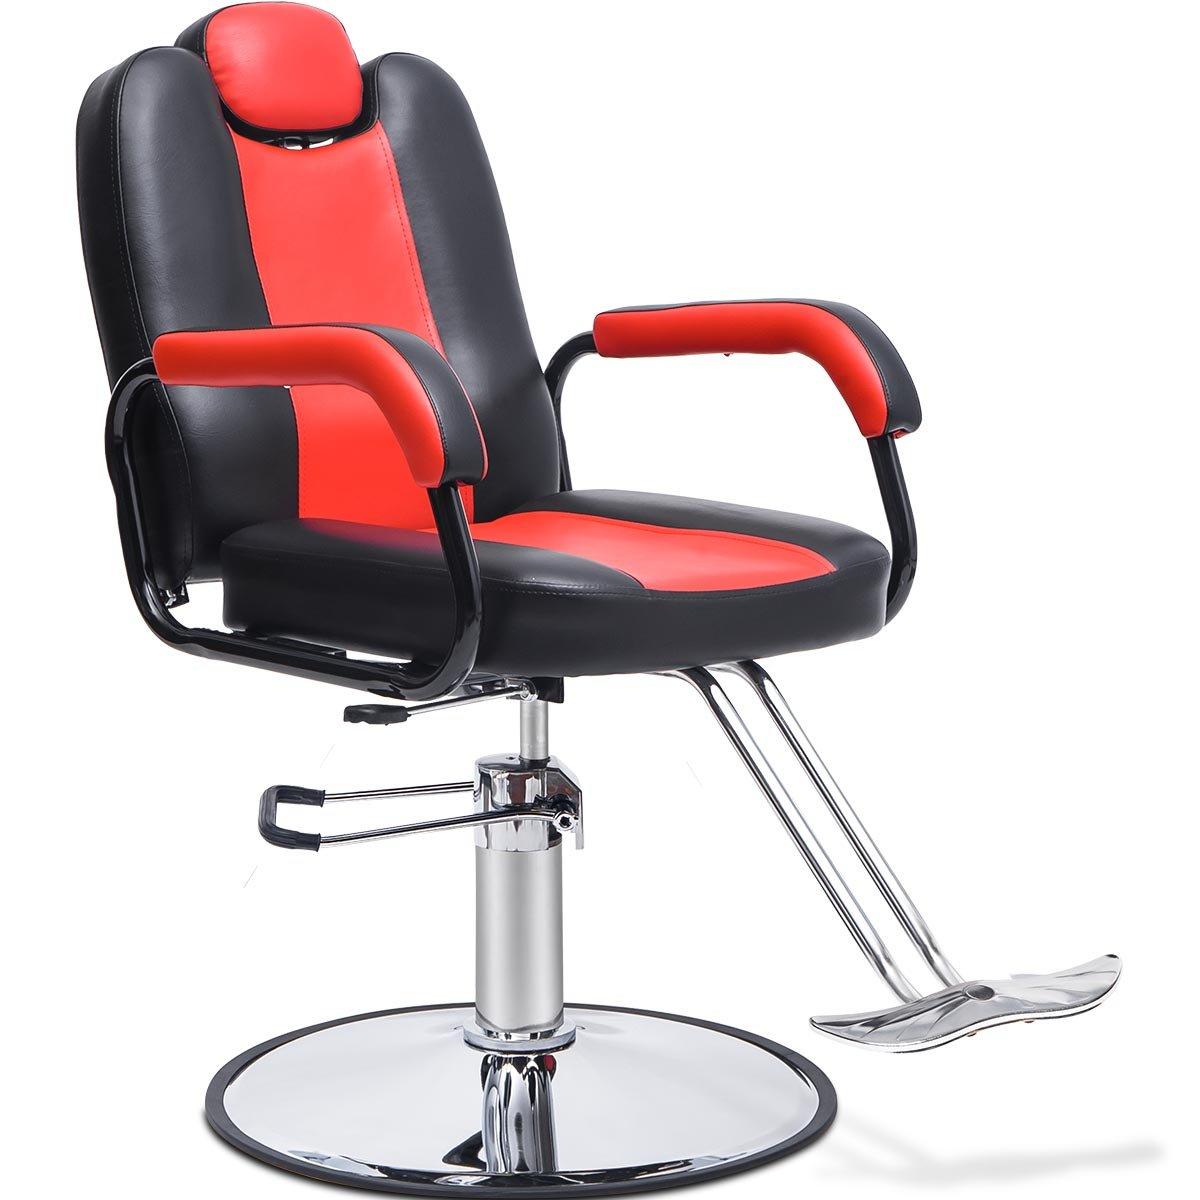 Merax Reclining Hydraulic Barber Chair Styling Salon Beauty Shampoo Spa Equipment (Black& Red Color)